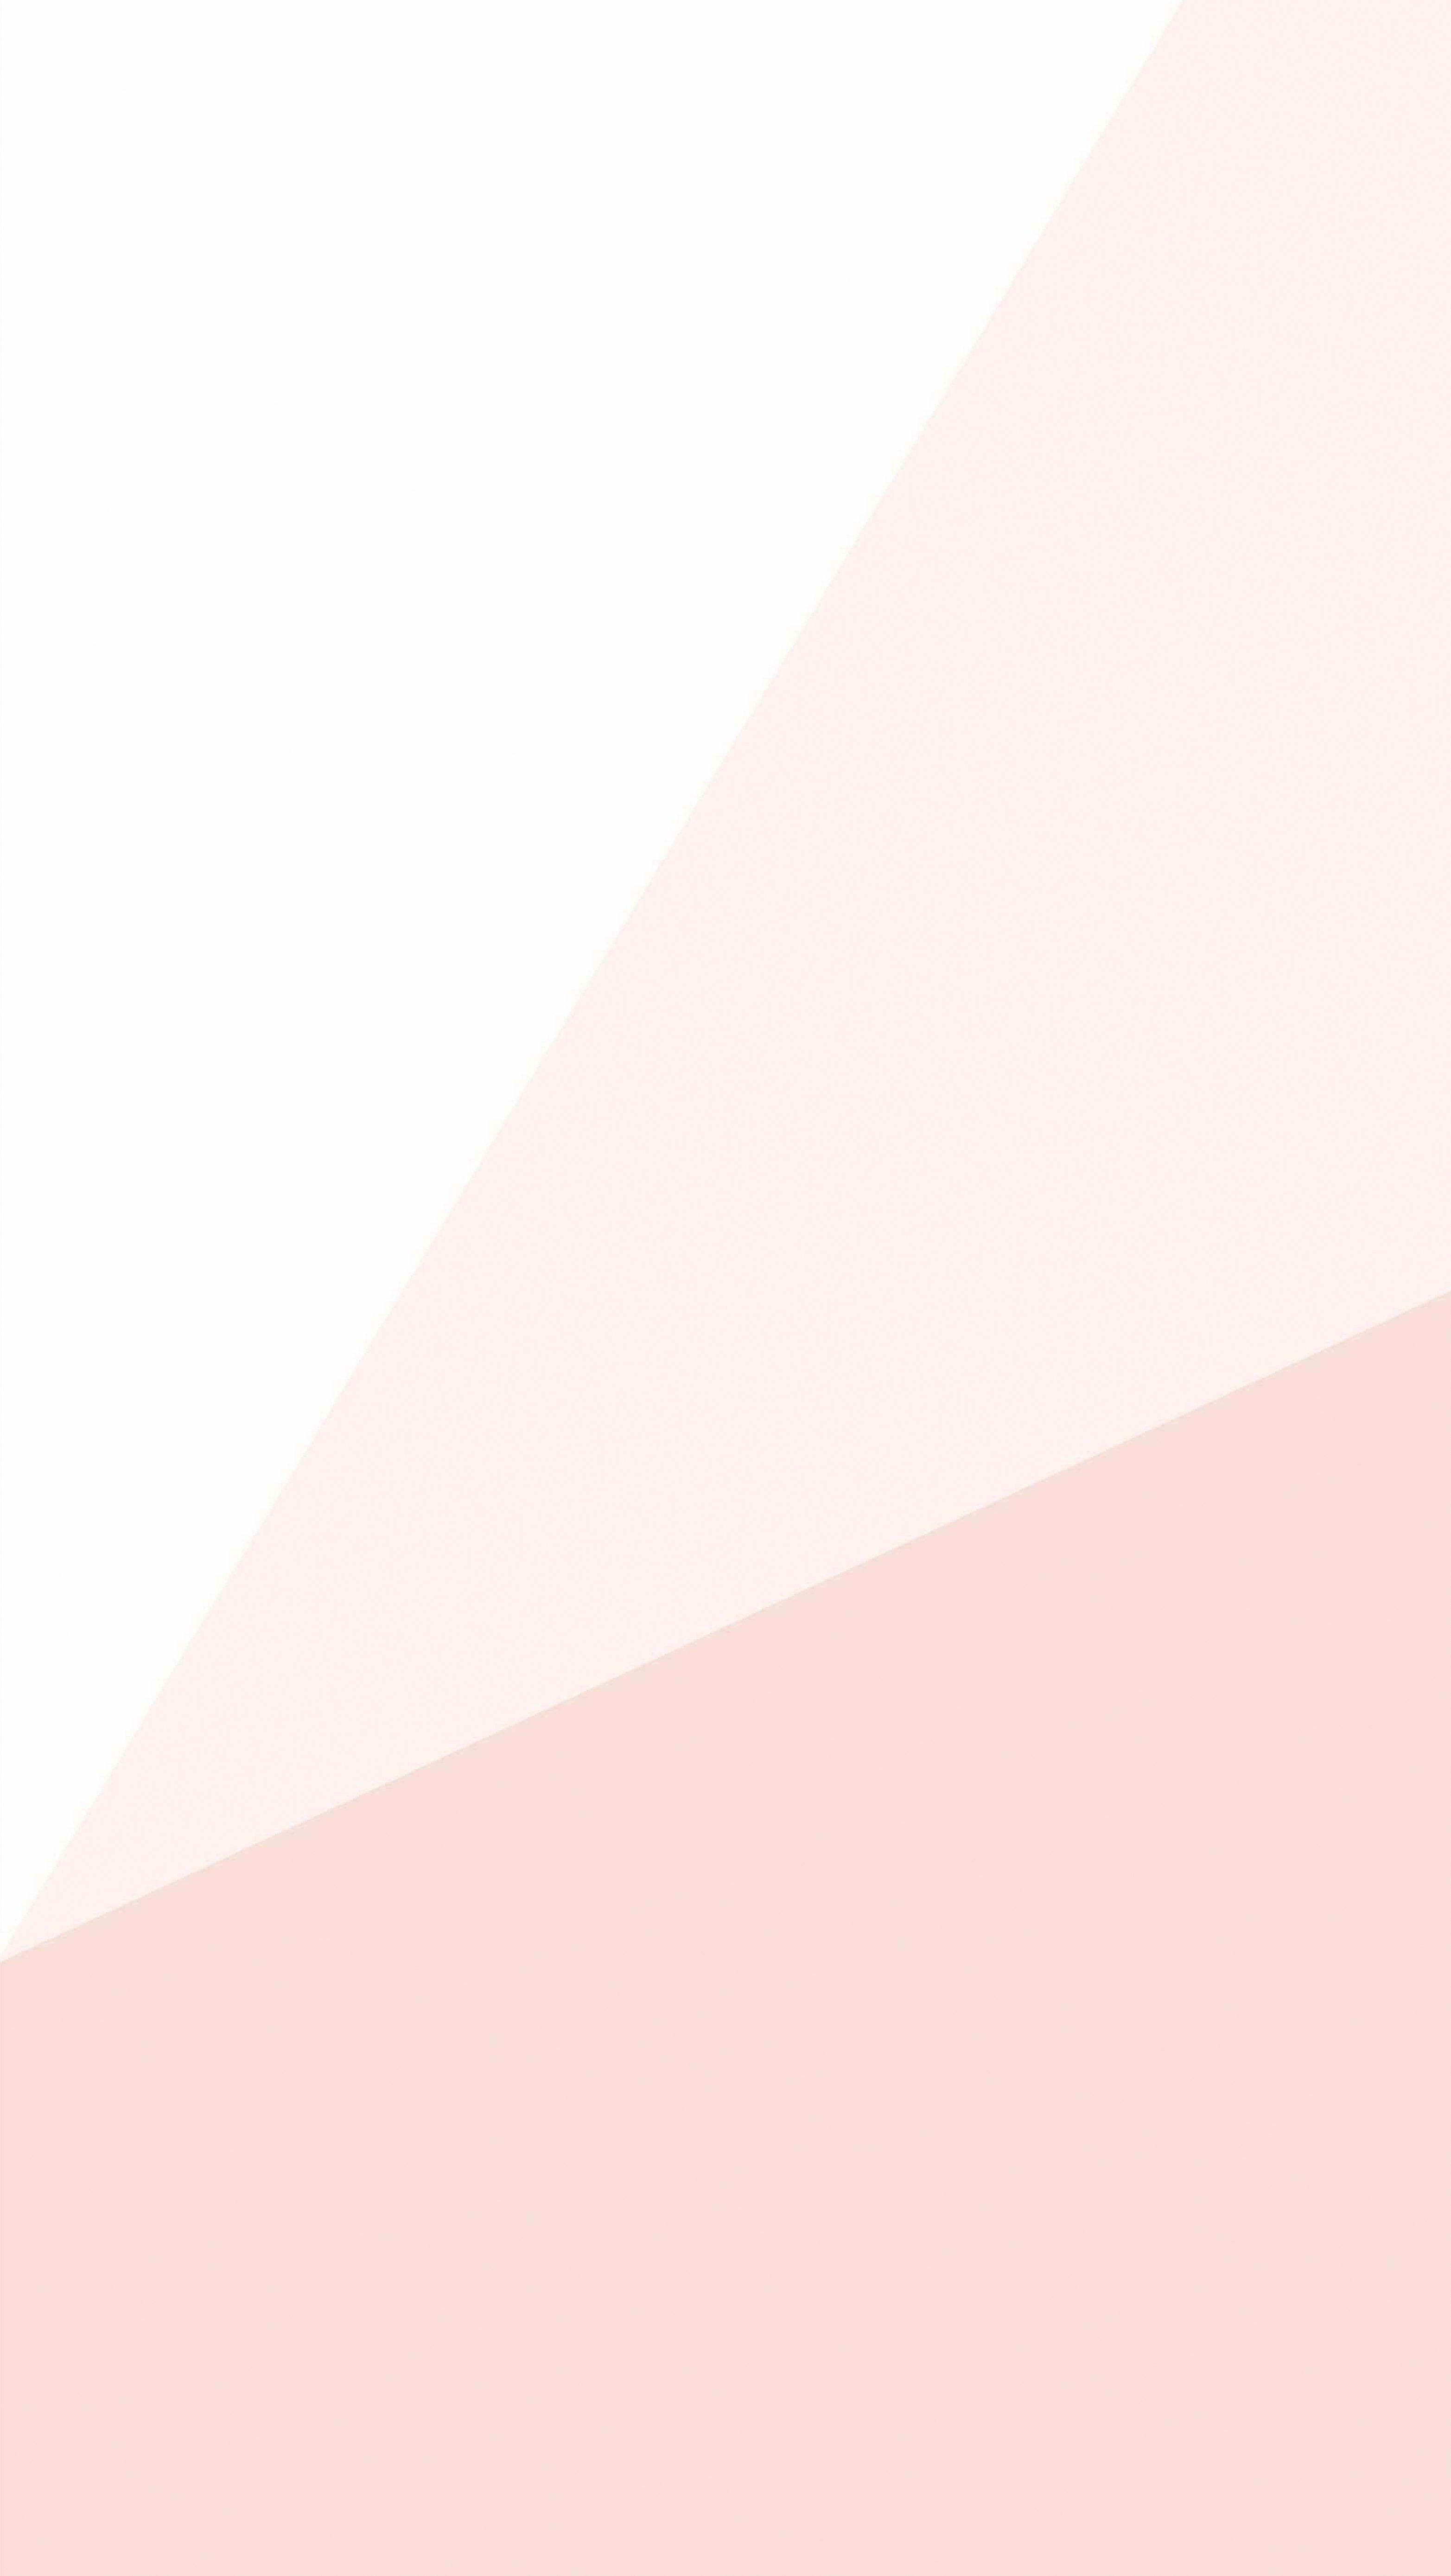 Arvo Be Good Do Good Arvowear Arvowear Pink Iphone Background Wallpaperiphone Wa Plain Wallpaper Iphone Pastel Background Wallpapers Plain Wallpaper